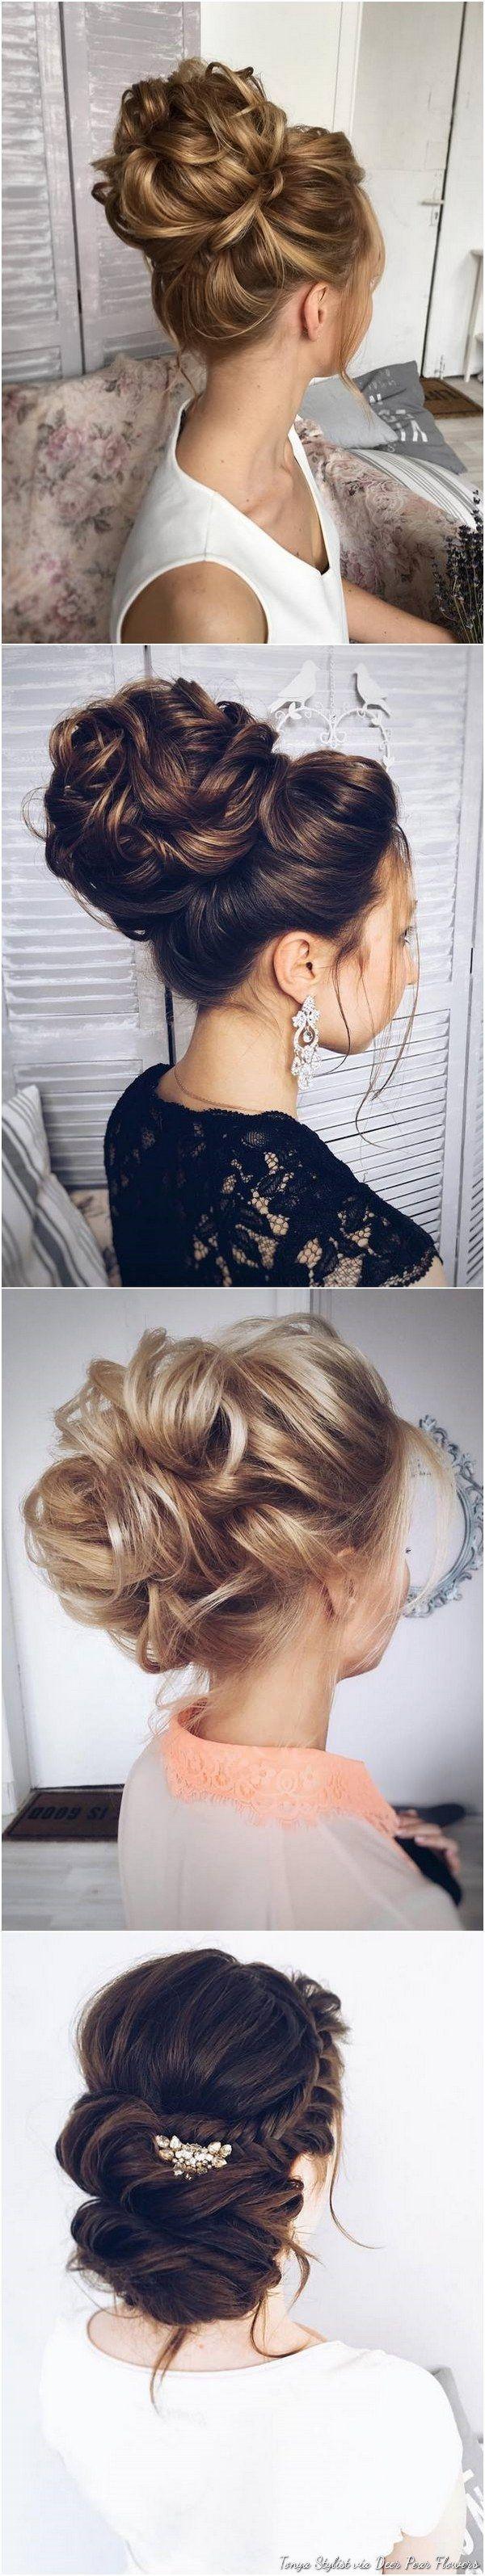 wedding hairstyles for long hair from tonyastylist weddings